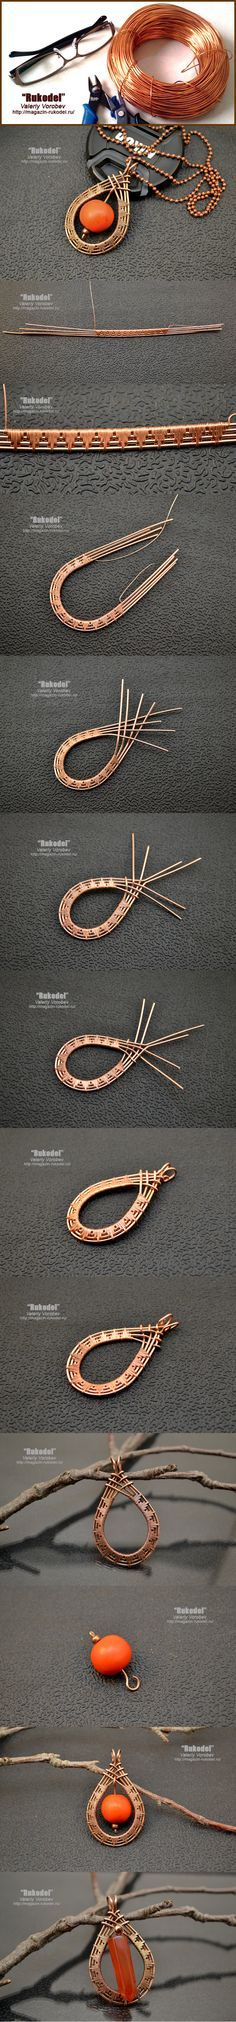 Wire Wrap Tutorial -http://jewelrydiyaccessories.blogspot.com/